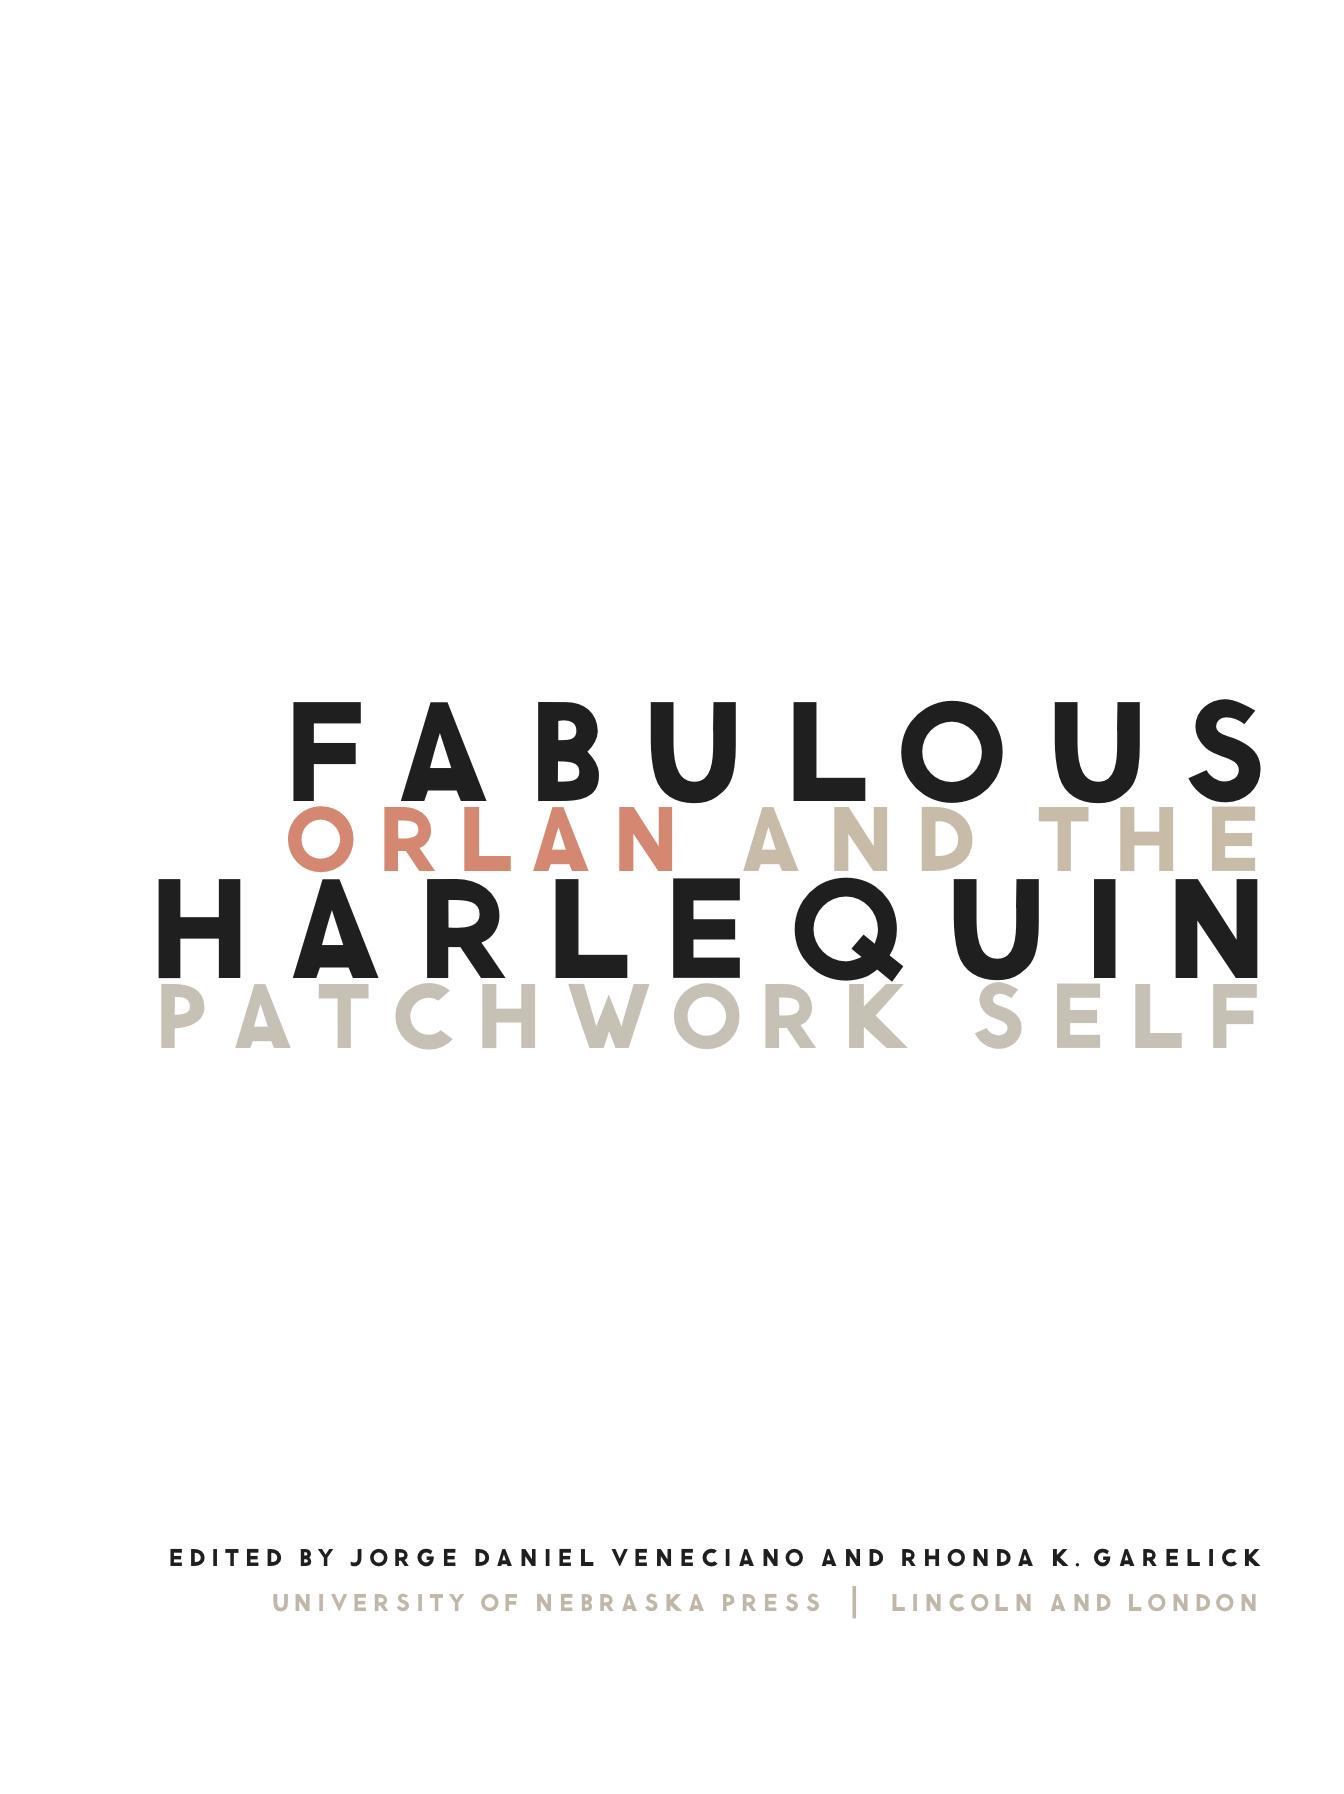 UNP_FabulousHarlequin_Sample(2).png